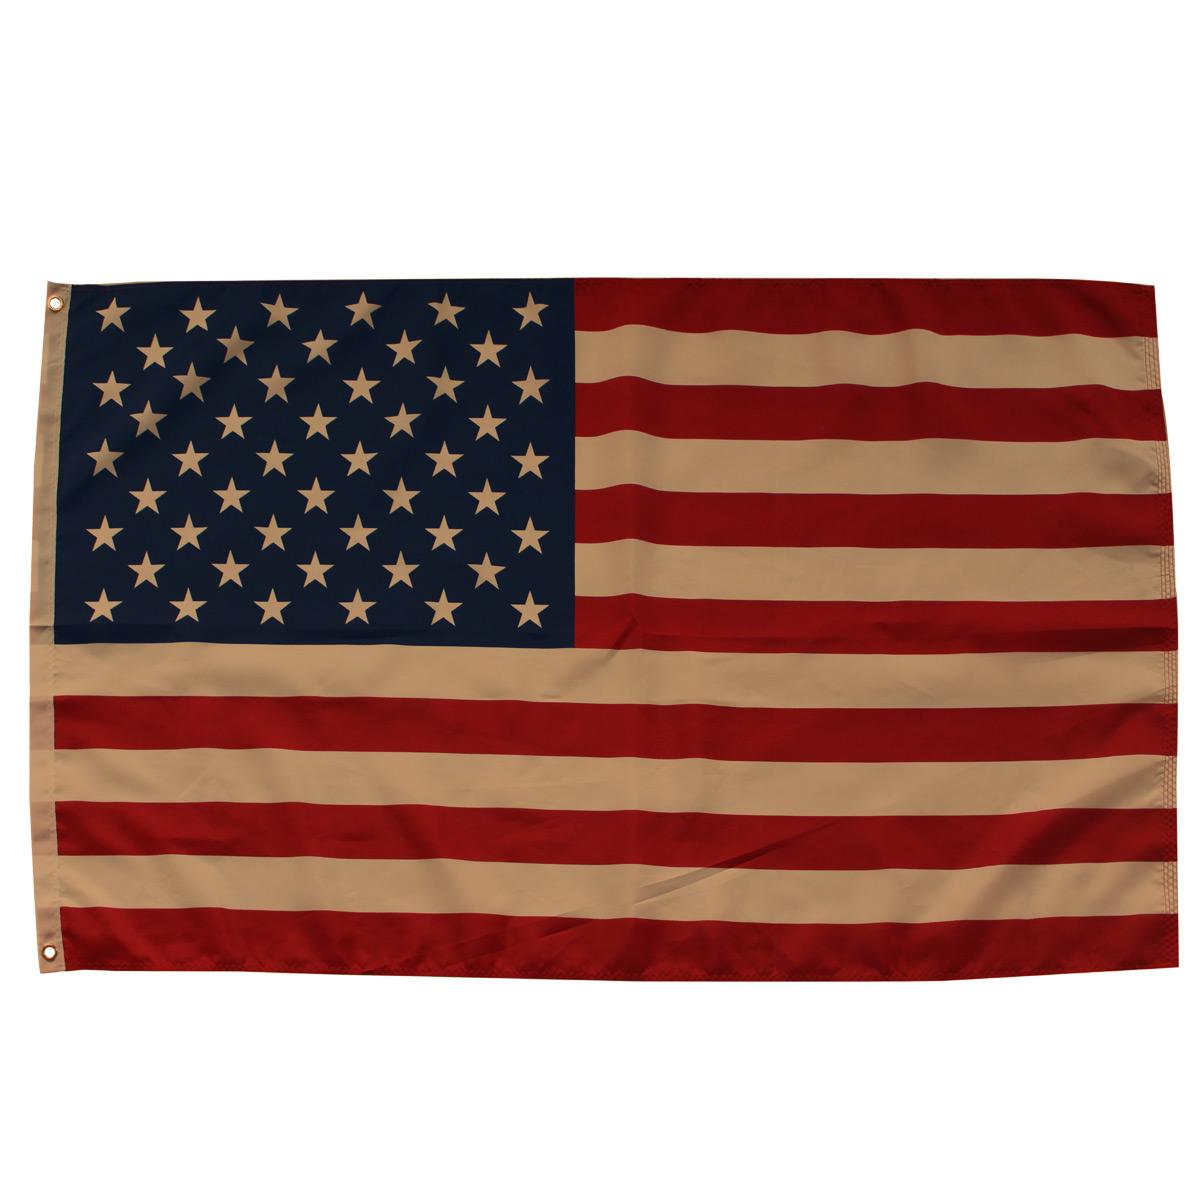 Tea Stained American Flag Grommet Flag Patriotic USA 3' x 5' Briarwood Lane